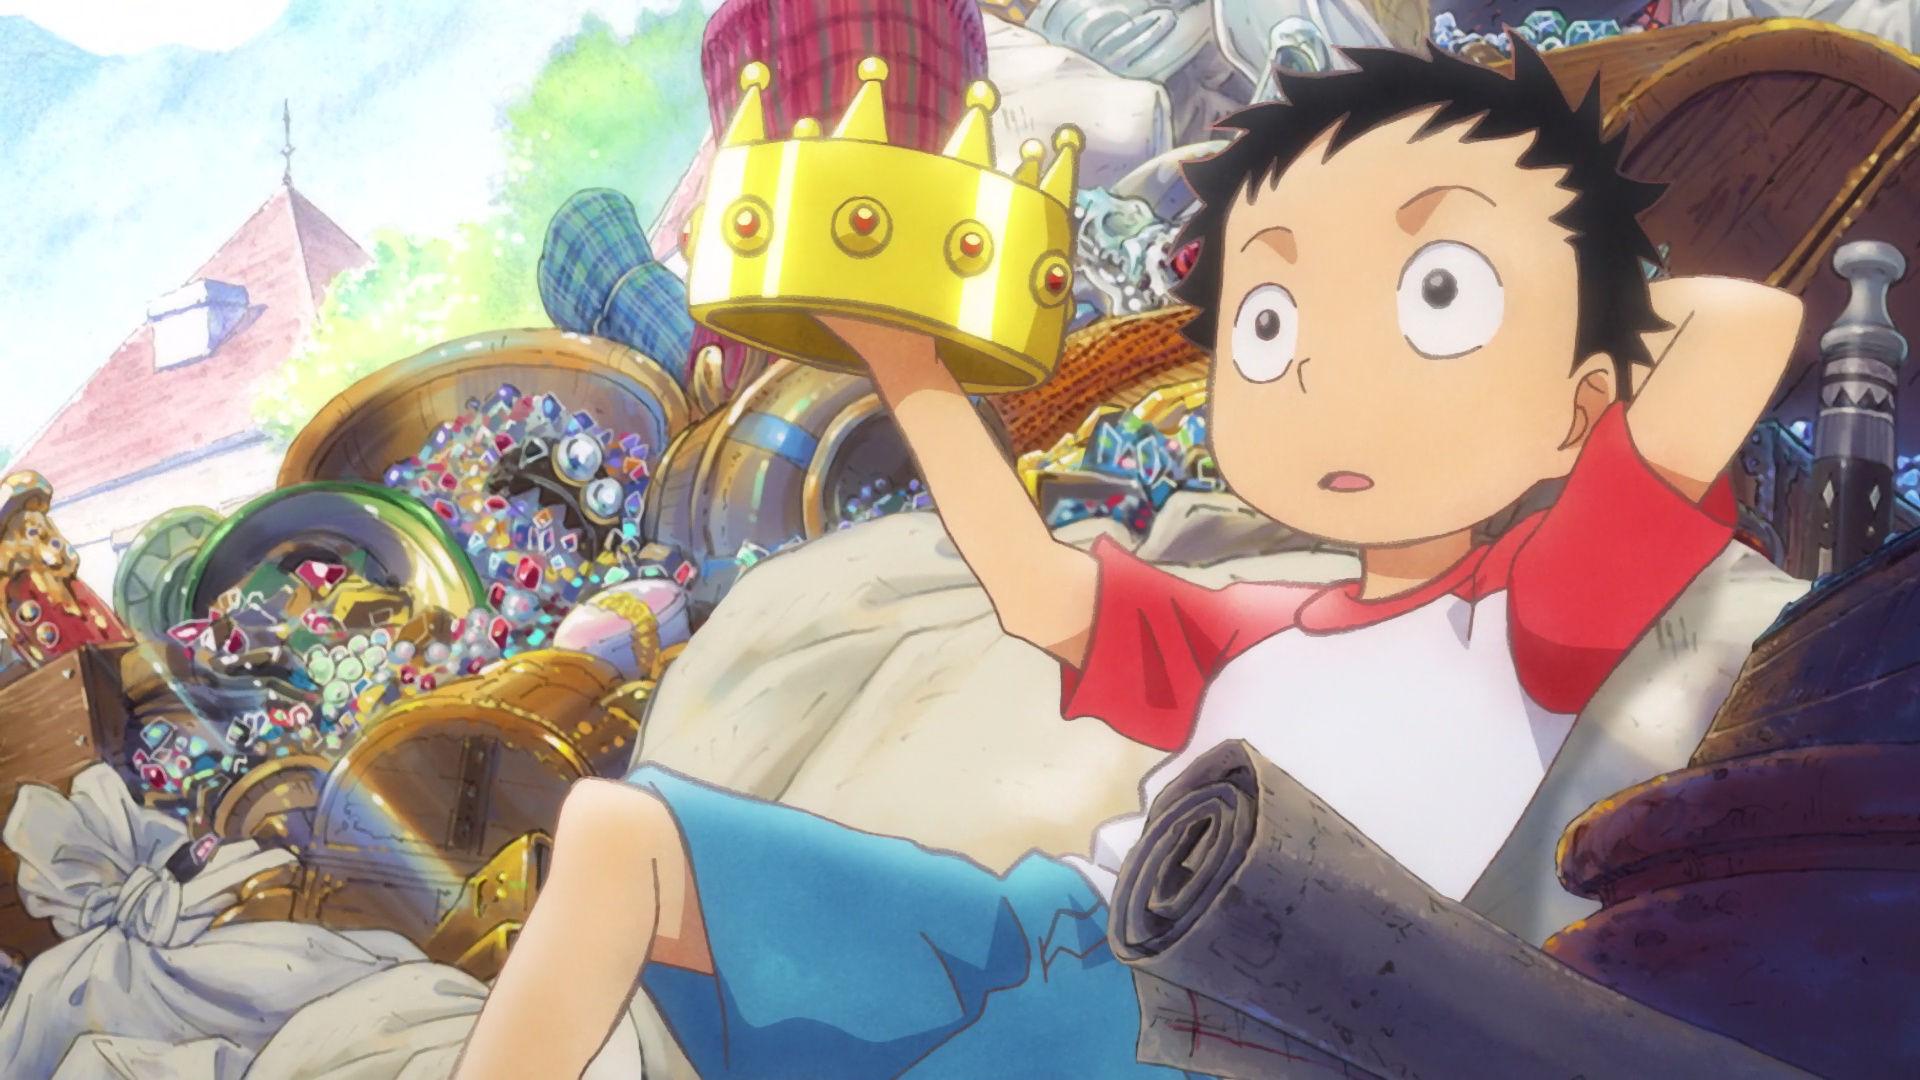 One Piece 907 Spécial 20 Ans Romance Dawn VOSTFR SD/HD/HD 10BITS/FHD News background